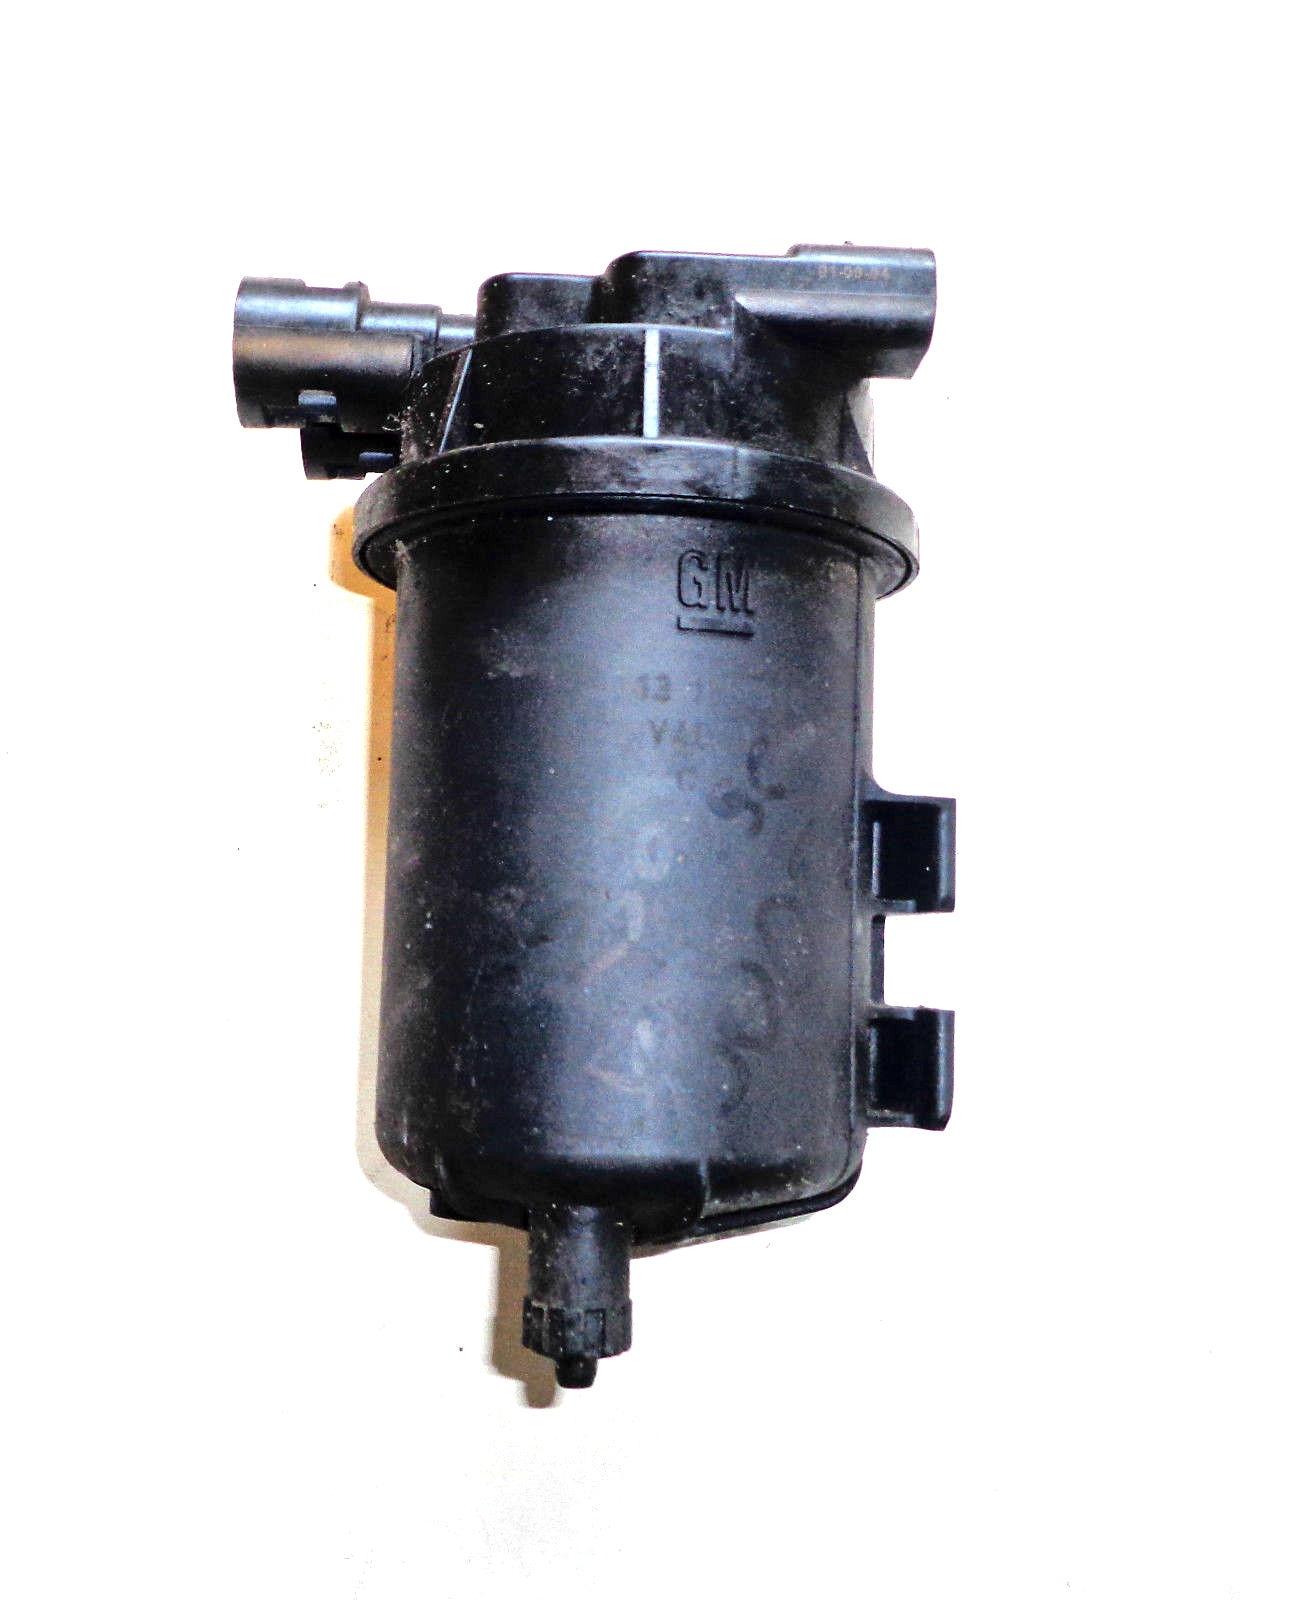 Genuine Vectra Signum Y30dt Fuel Filter Housing 13165310 Ebay 05 Dodge Diesel Vauxhall